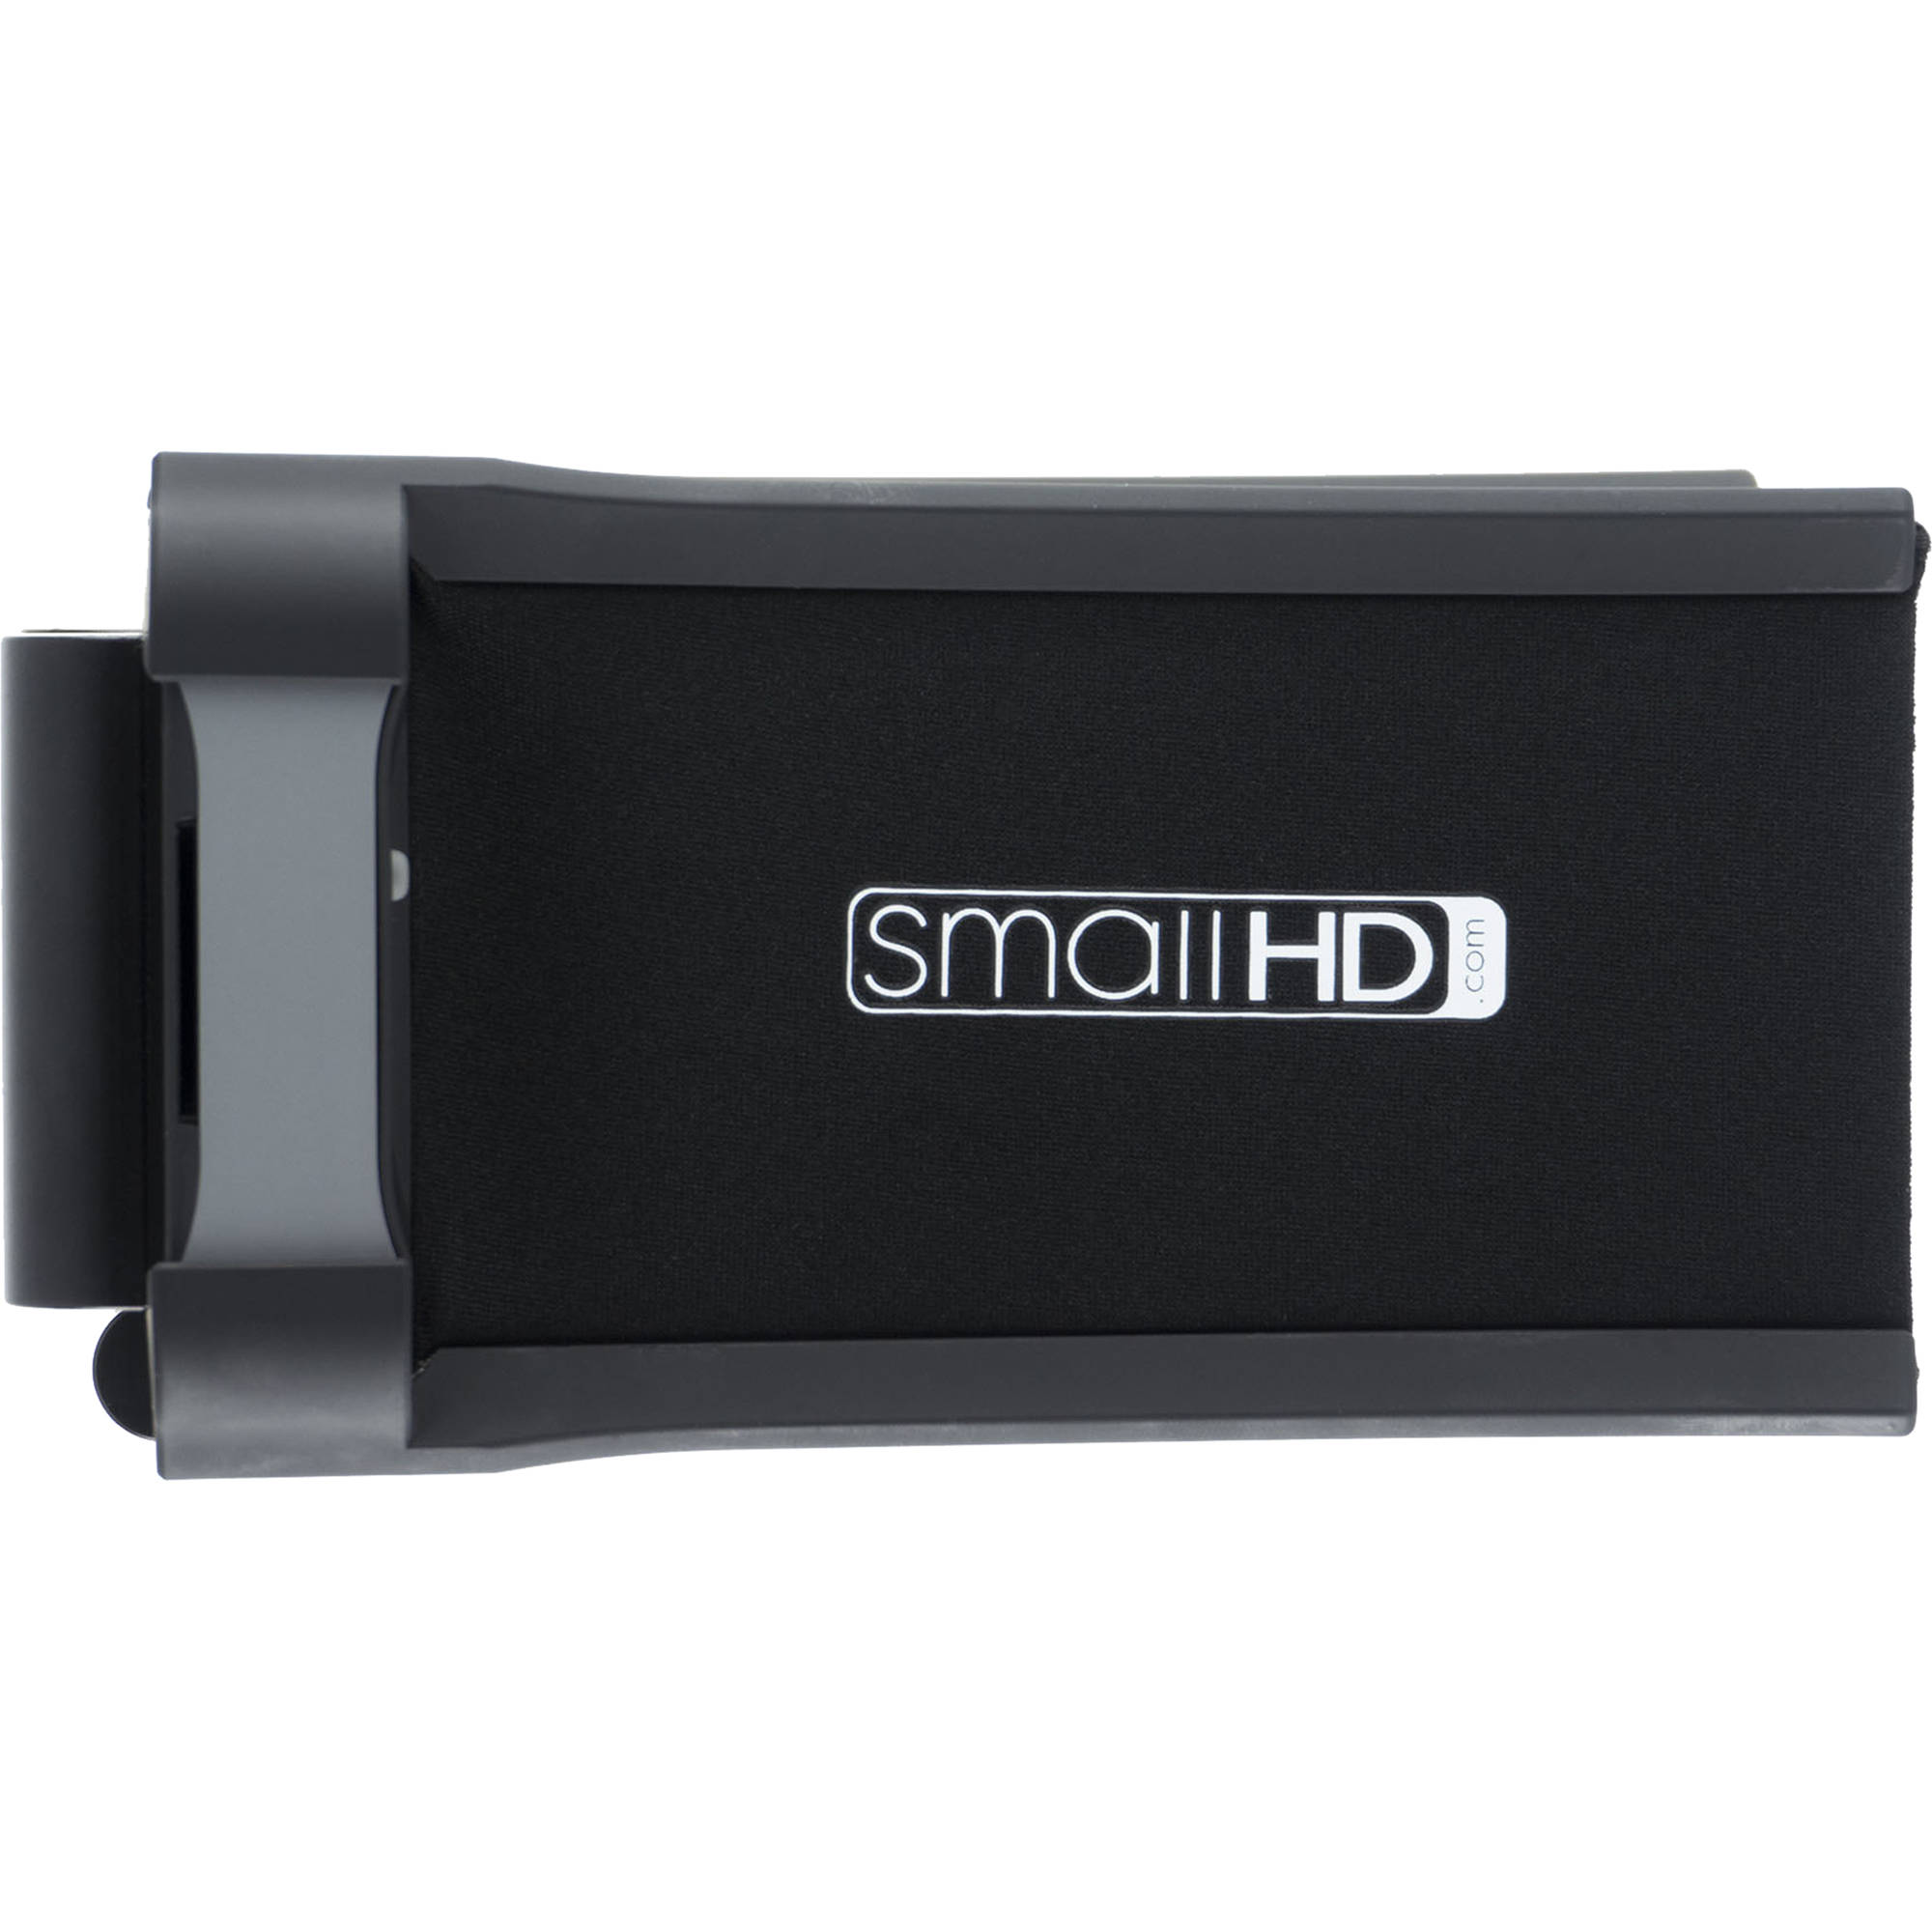 Https C Product 1162392 Reg E Smile Mini Keyboard K 1000 Smallhd Acc Hood 500 4 Sided Sun For 1194349